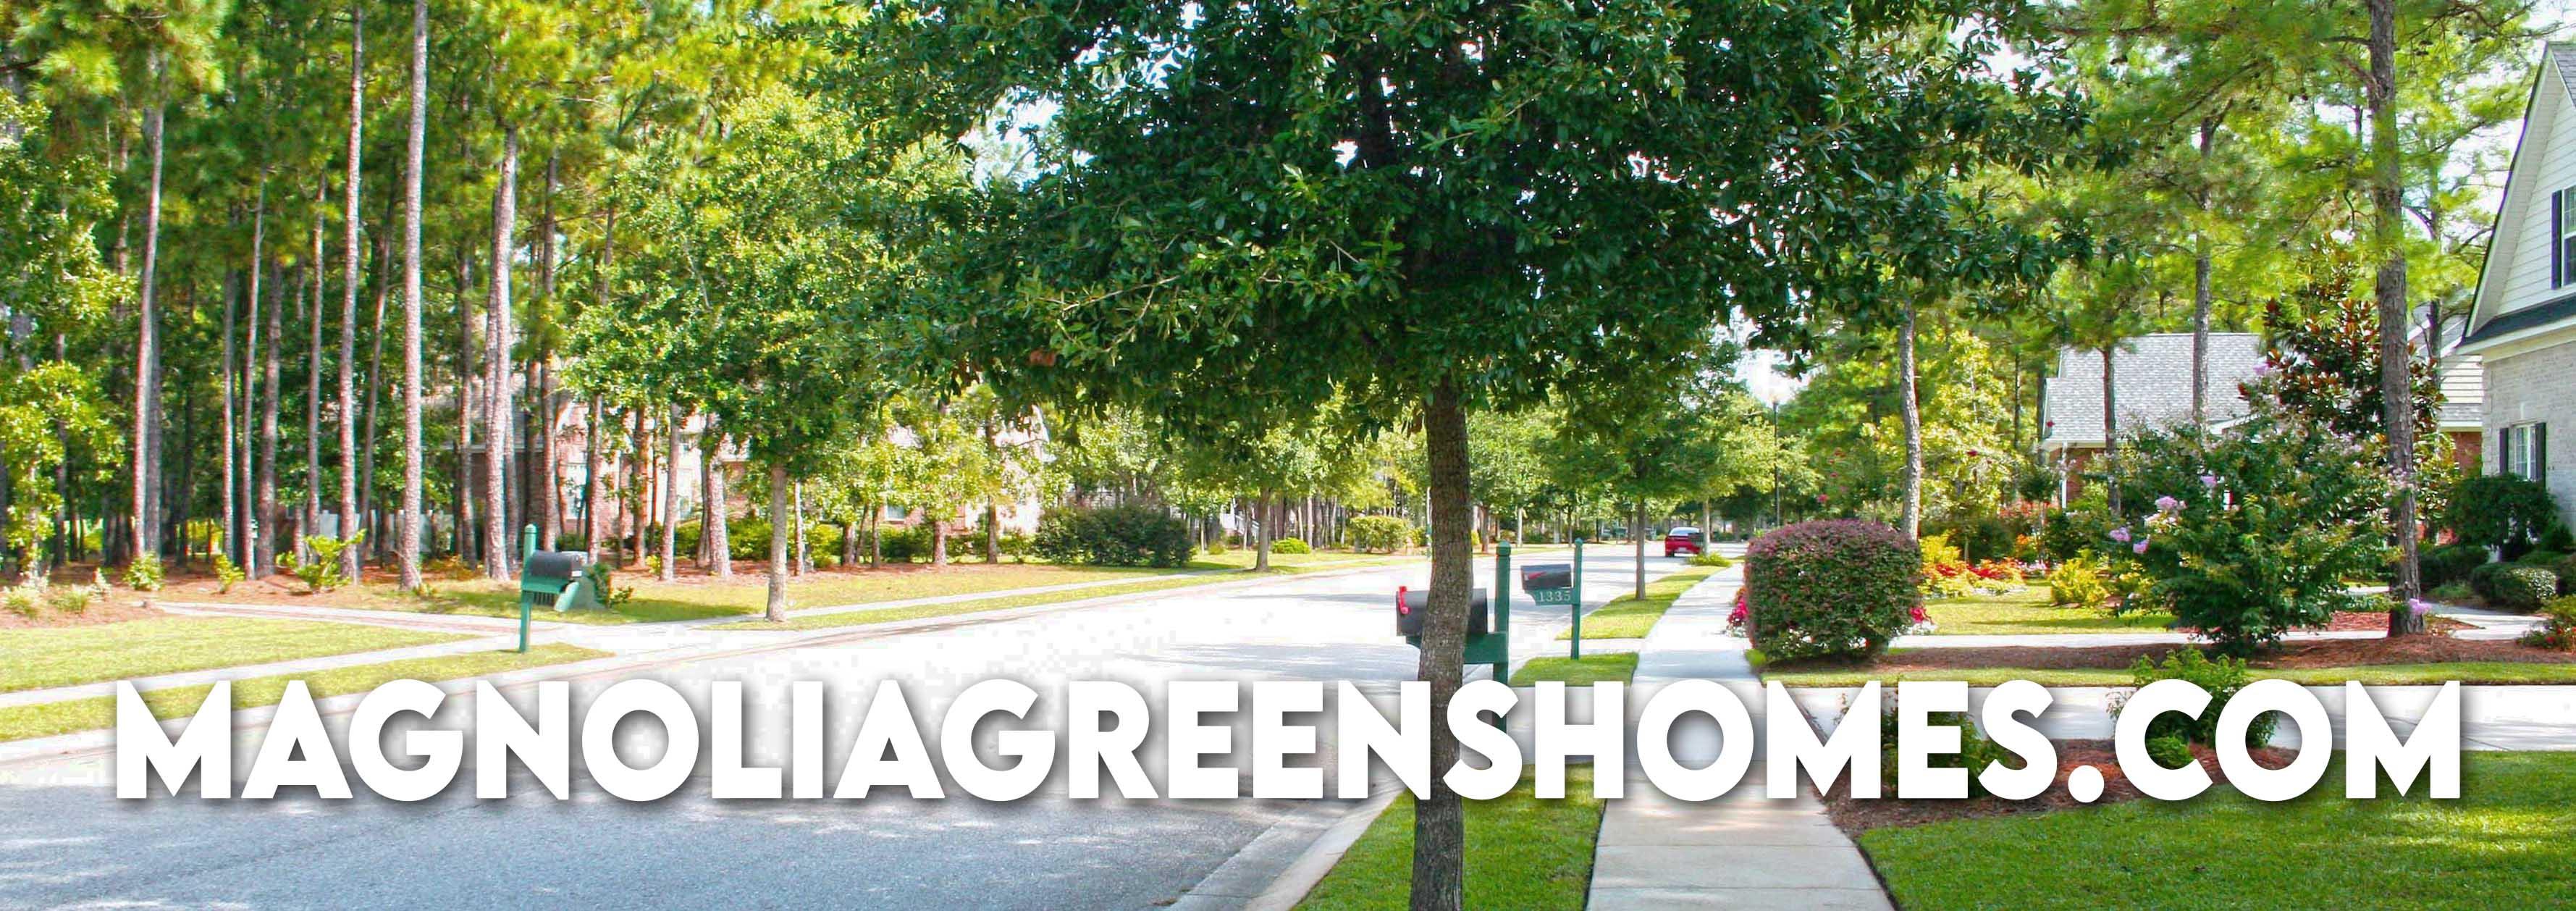 Magnolia Greens